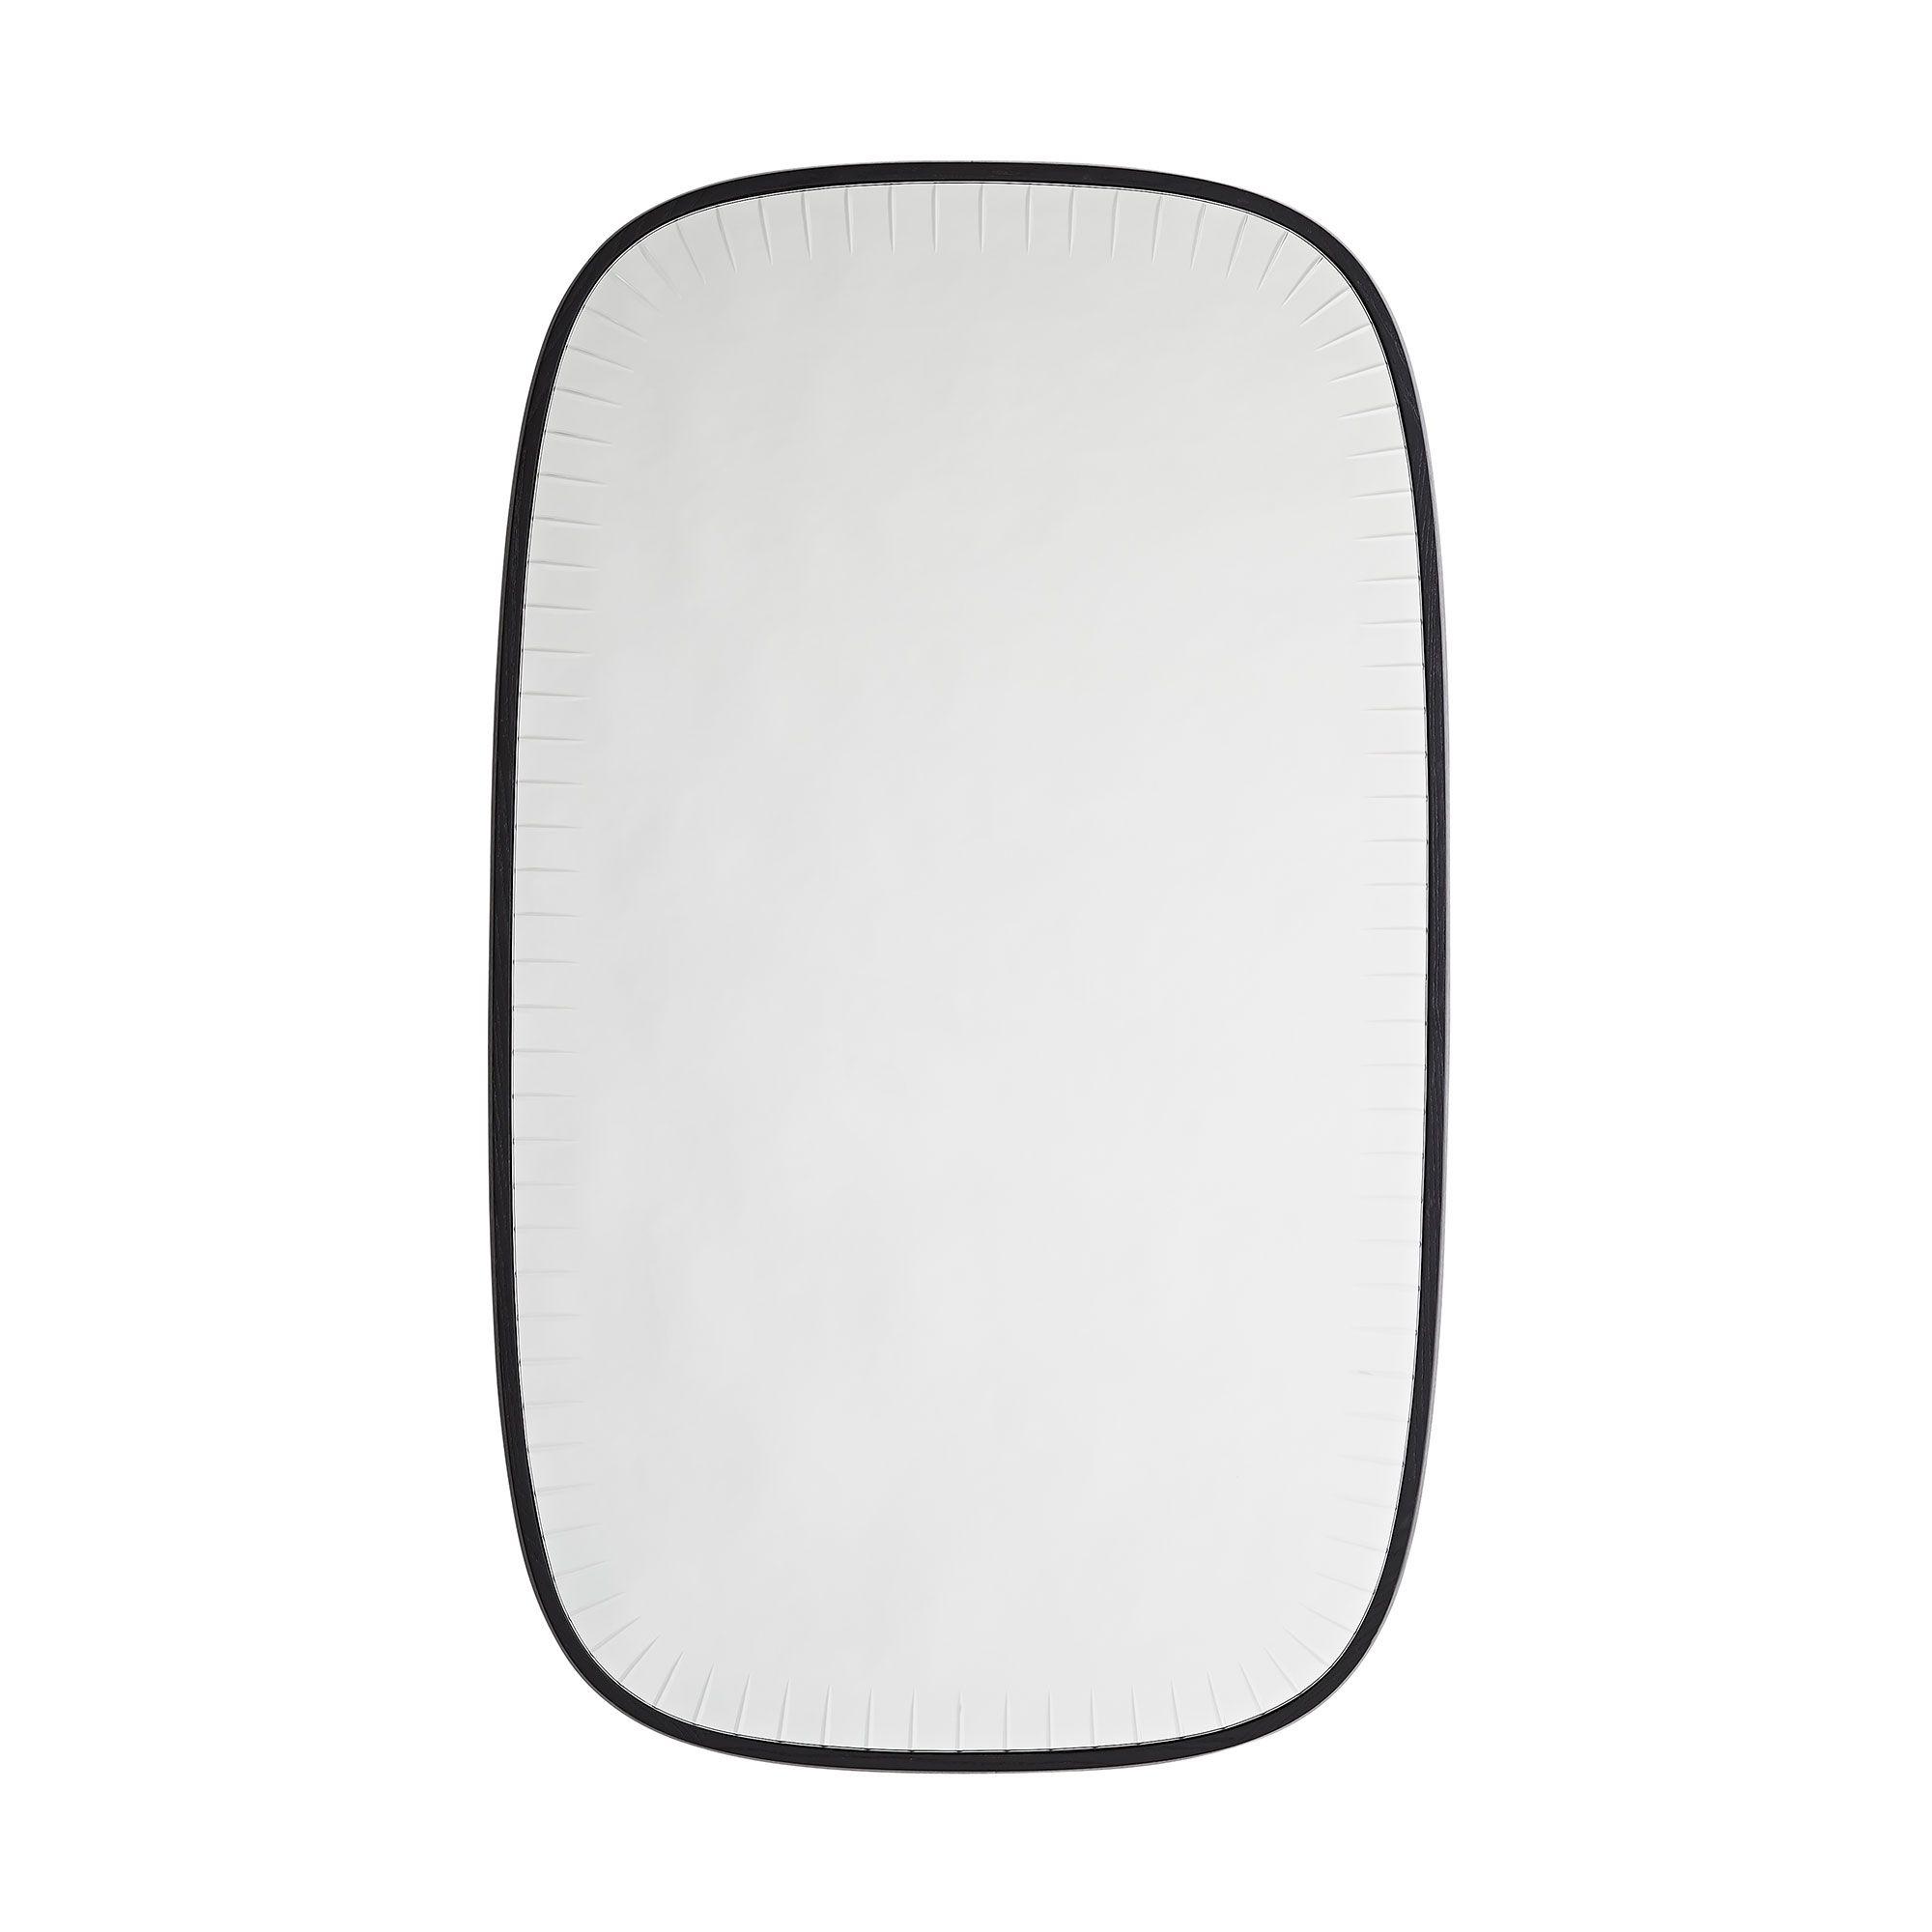 Cut Oblong Mirror